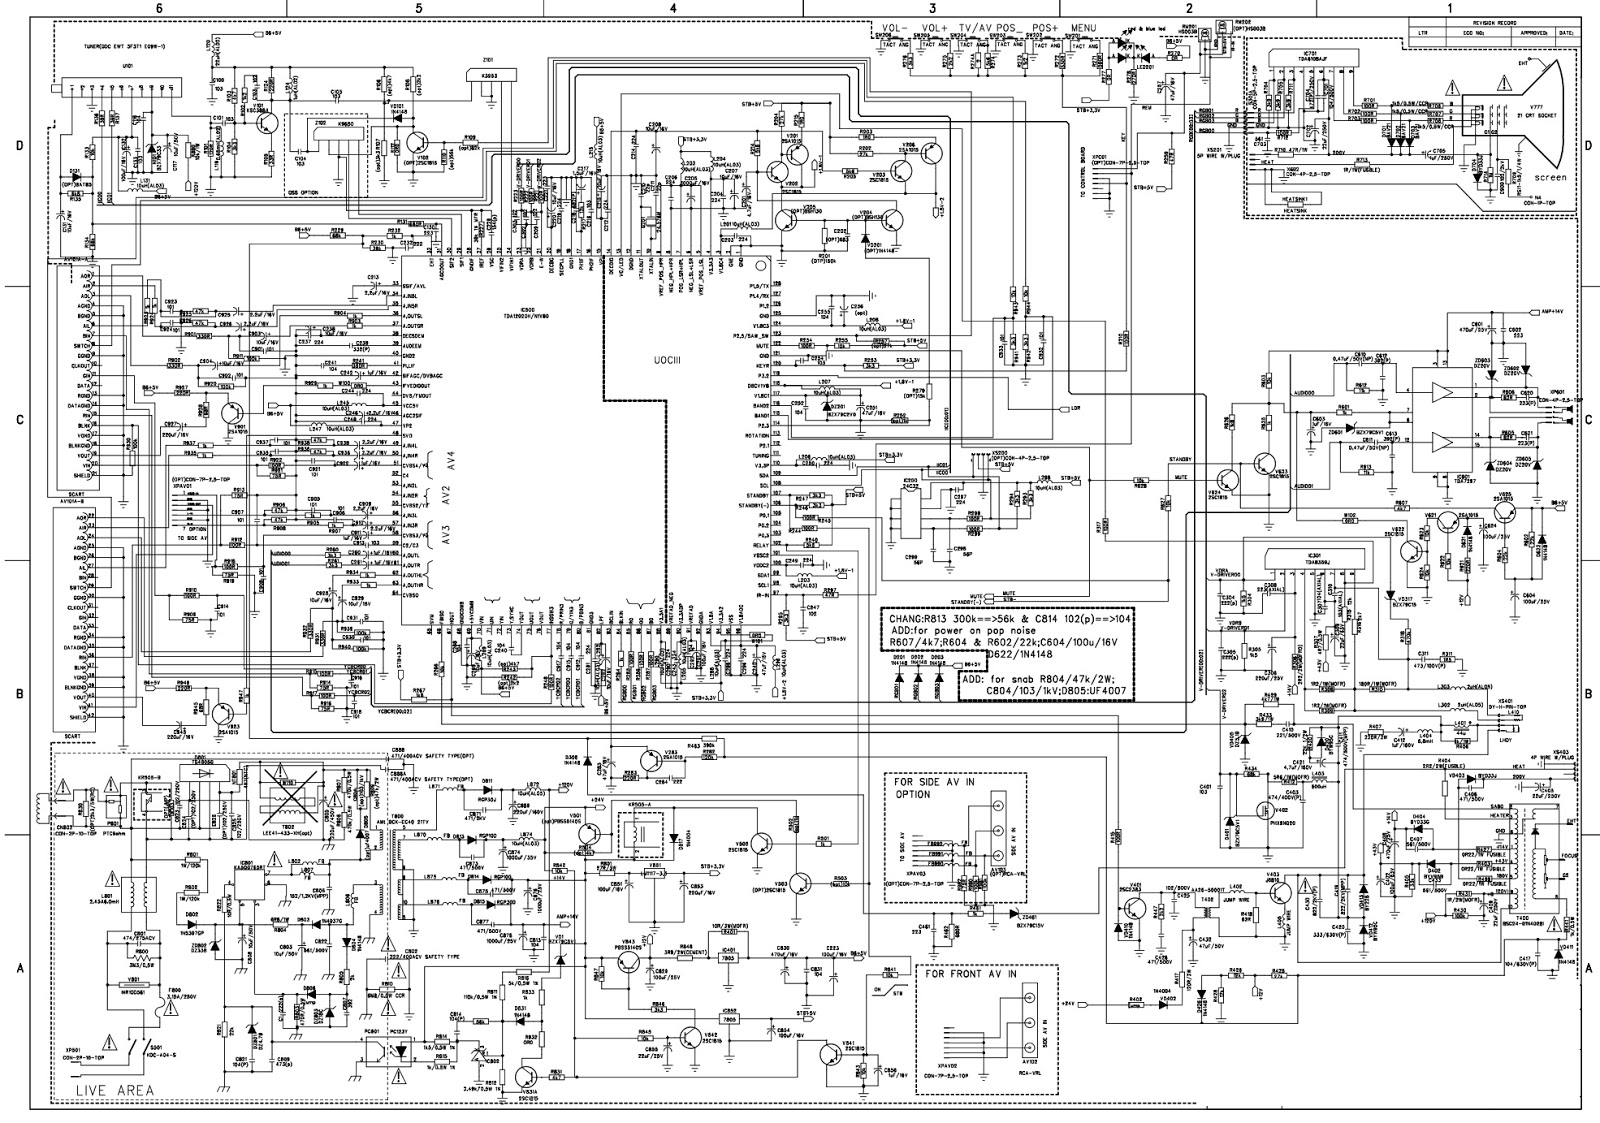 tv tuner card circuit diagram 2001 mustang v6 radio wiring videocon 21 inch ctvs diagrams  tda 12135 and